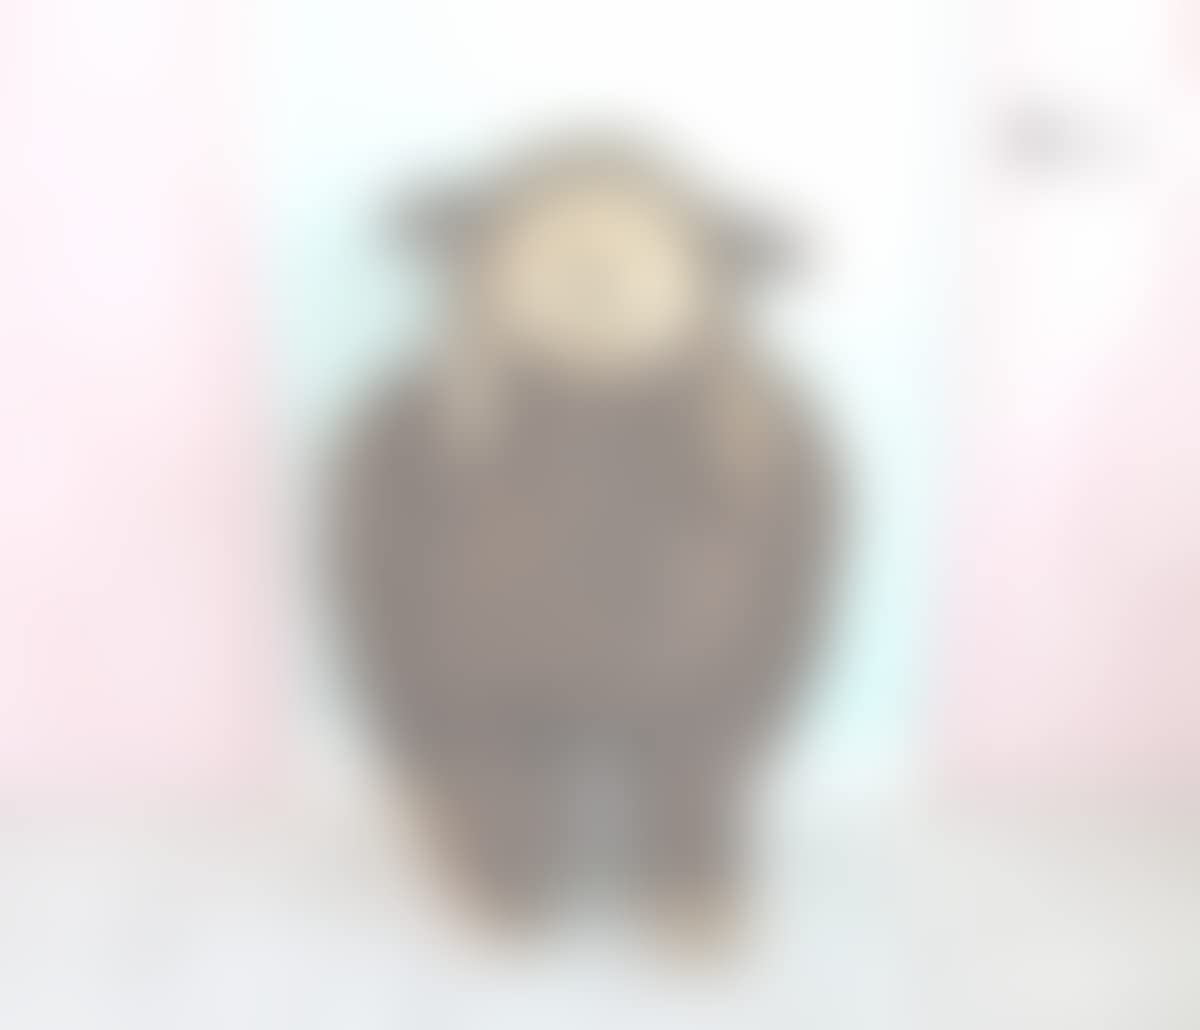 Amazon.com: LUDO - LABYRINTH. Plush toy.: Handmade